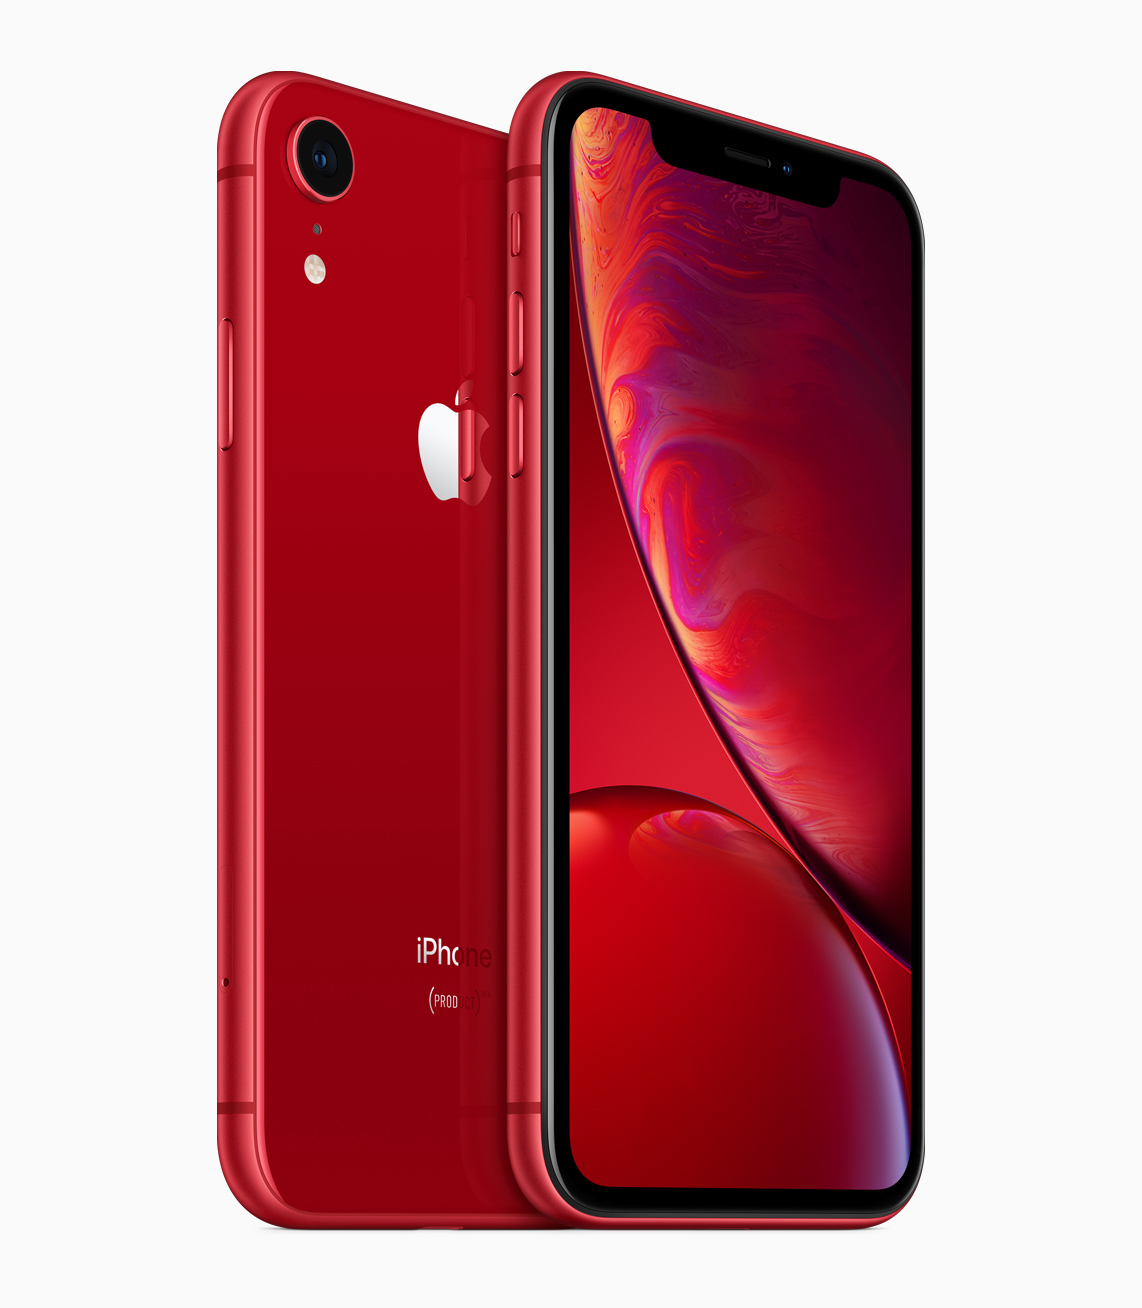 iPhone_XR_red-back_09122018.jpg